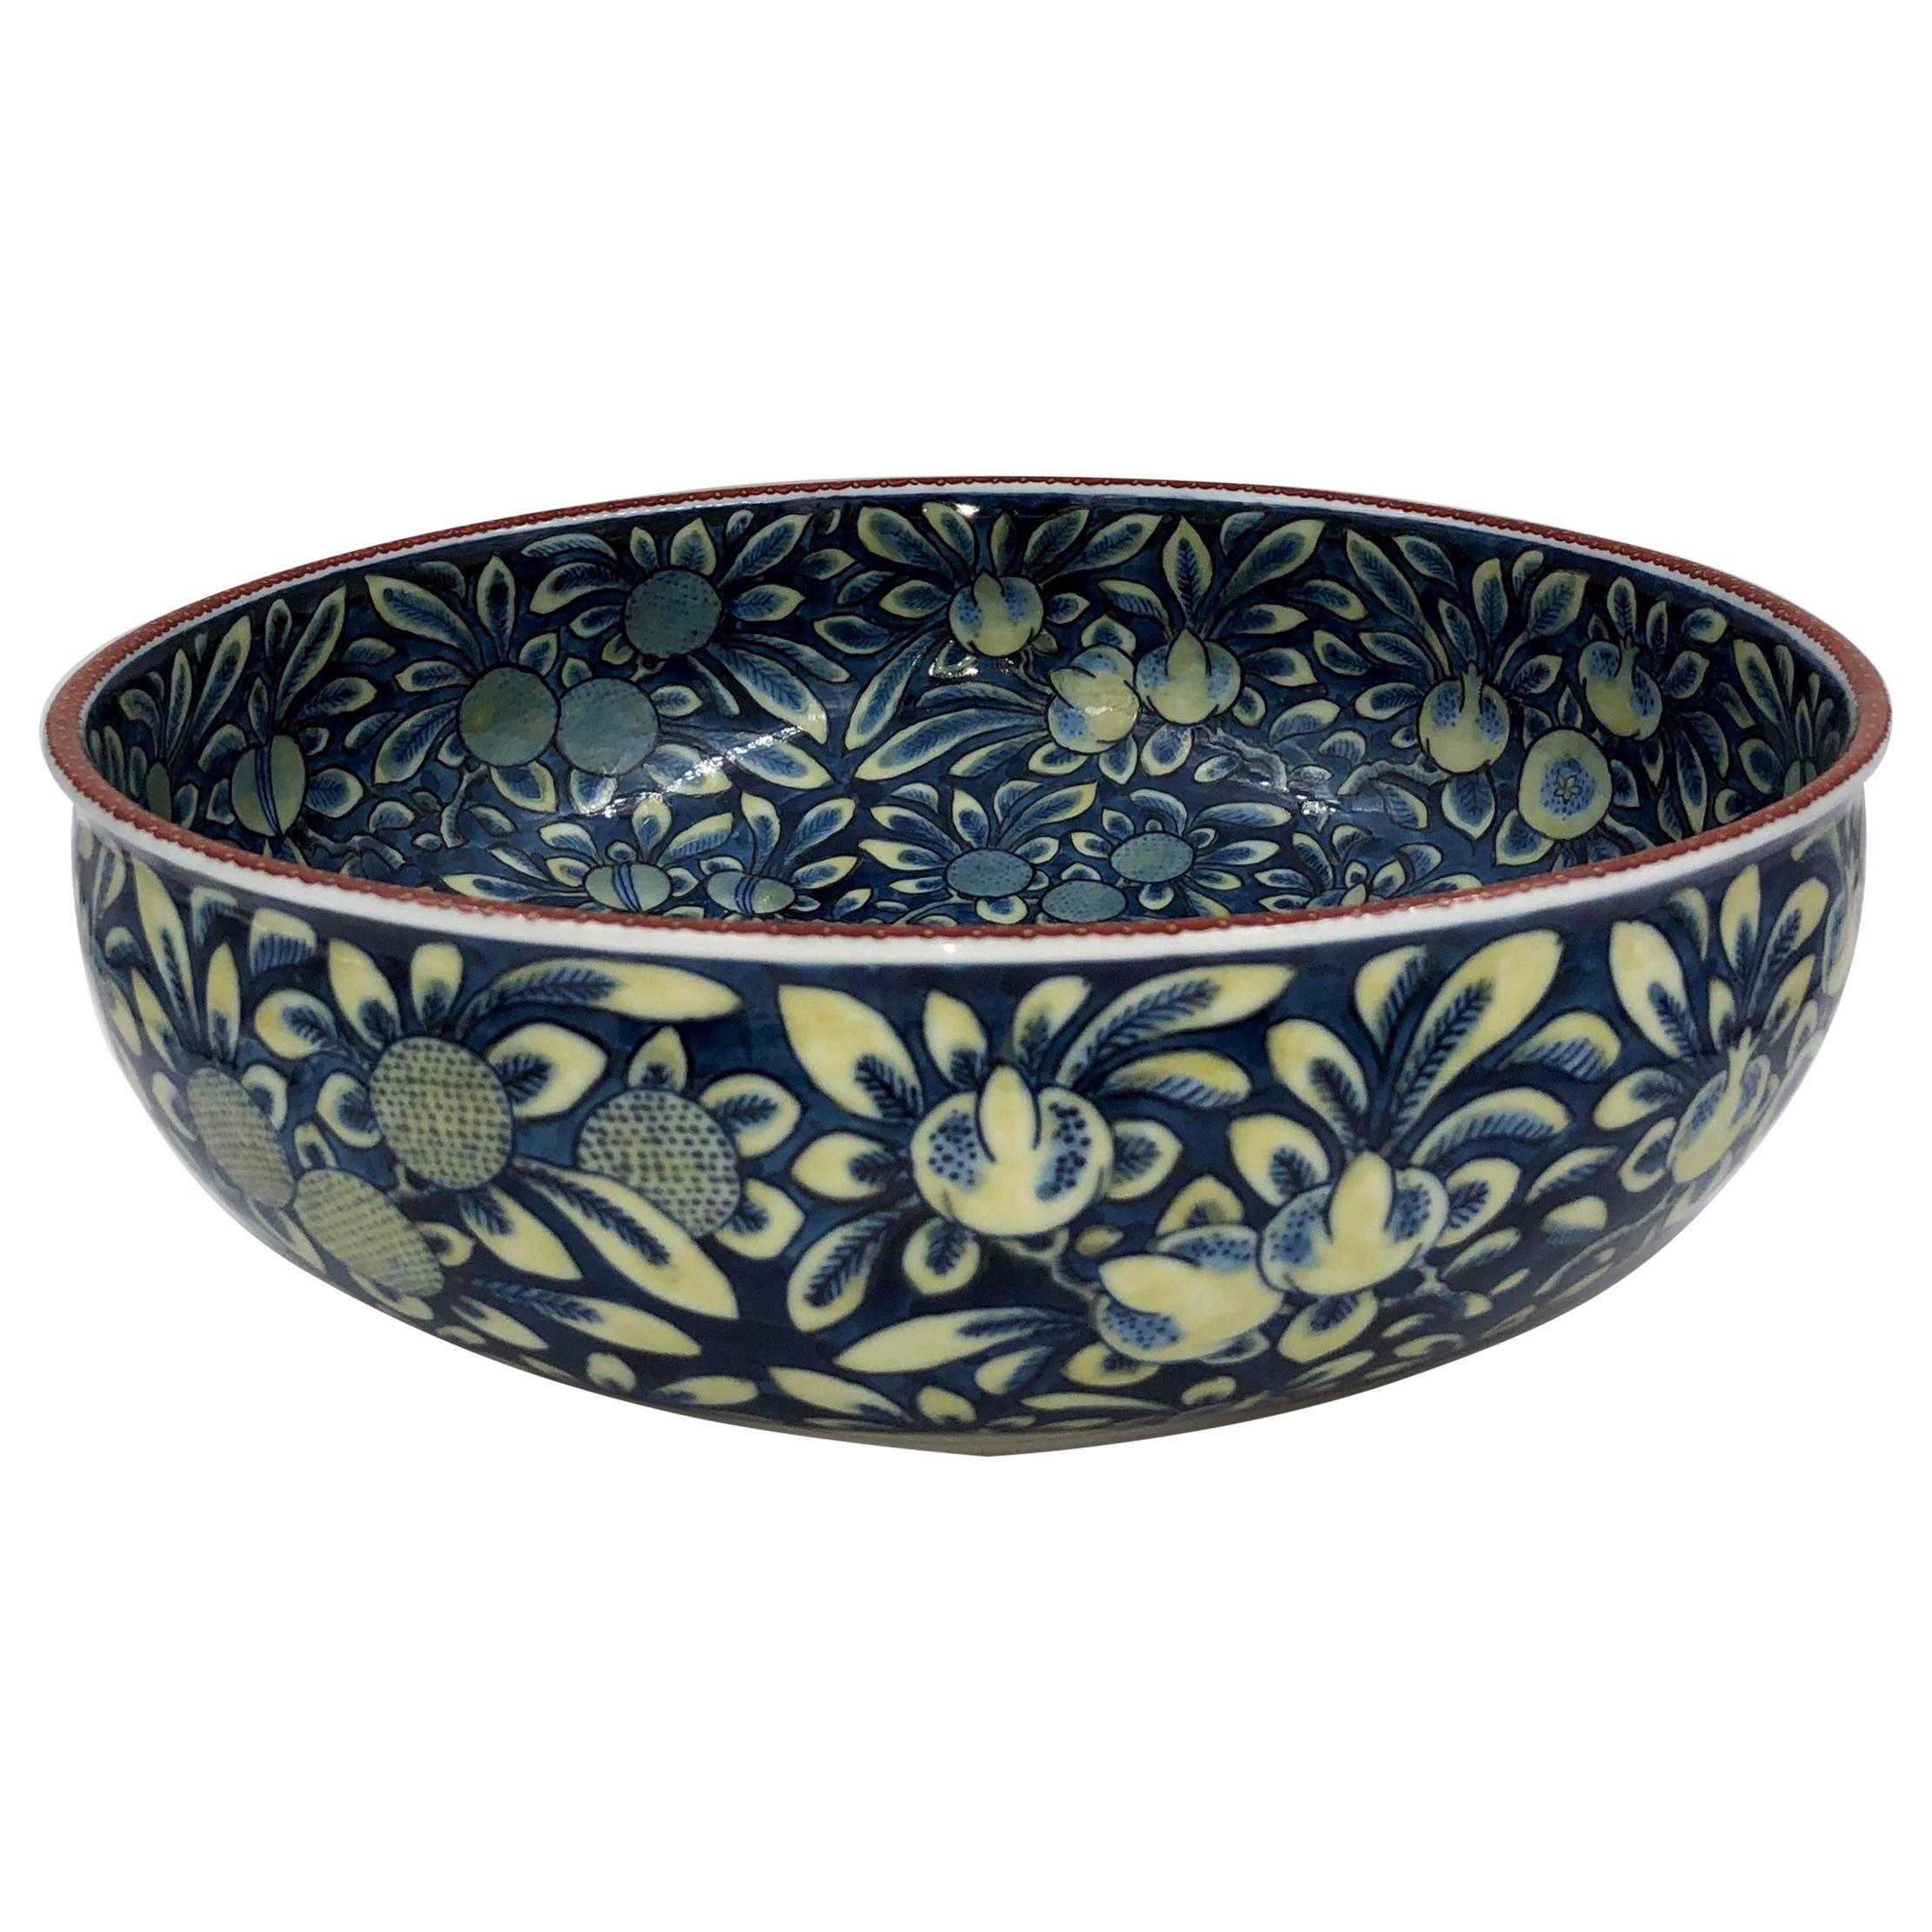 Blue Cream Contemporary Porcelain Bowl by Japanese Master Artist